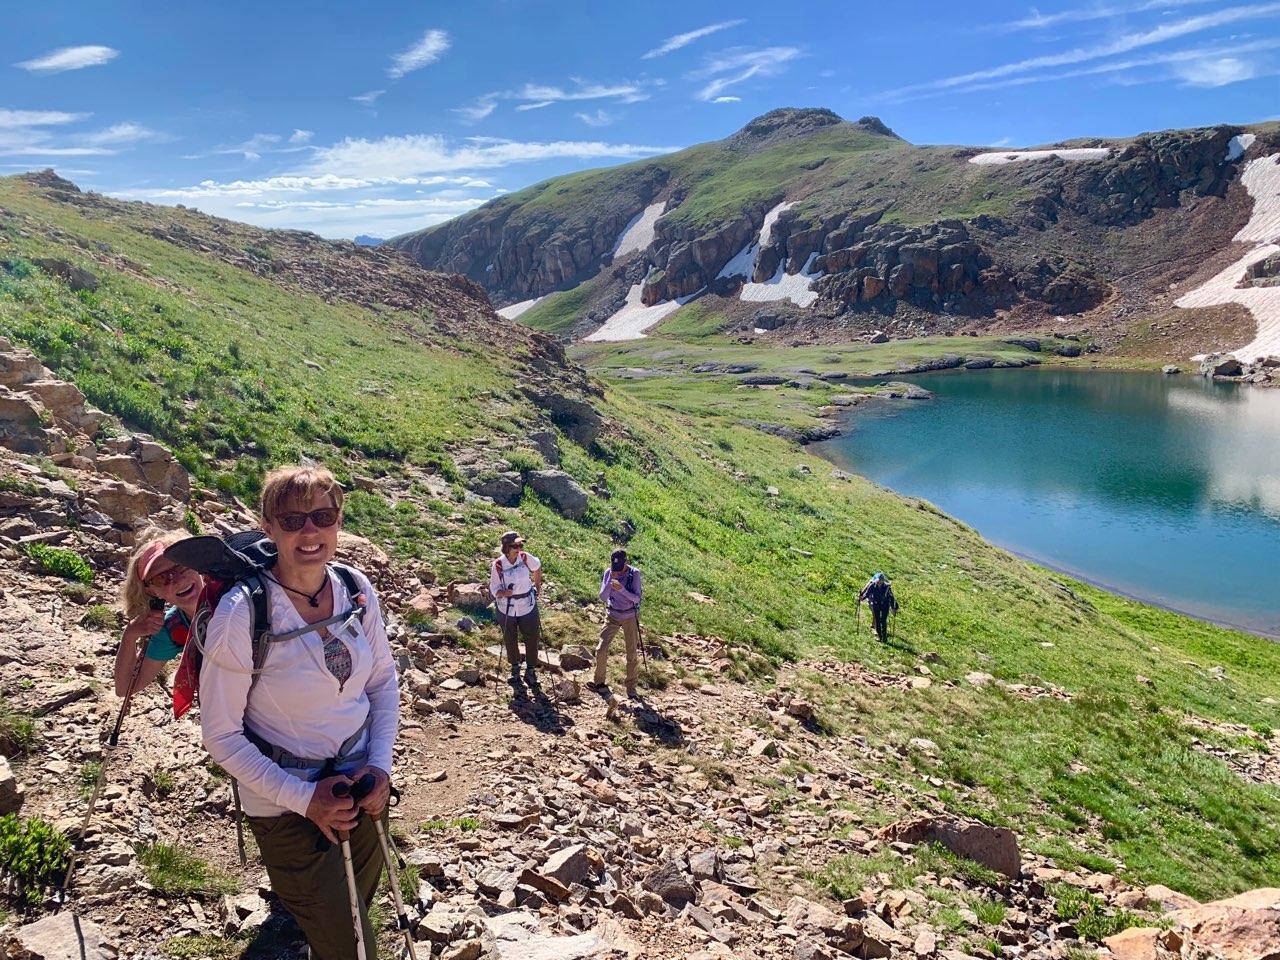 Moxies hike above Bullion King Lake, ©Lisa Vajda